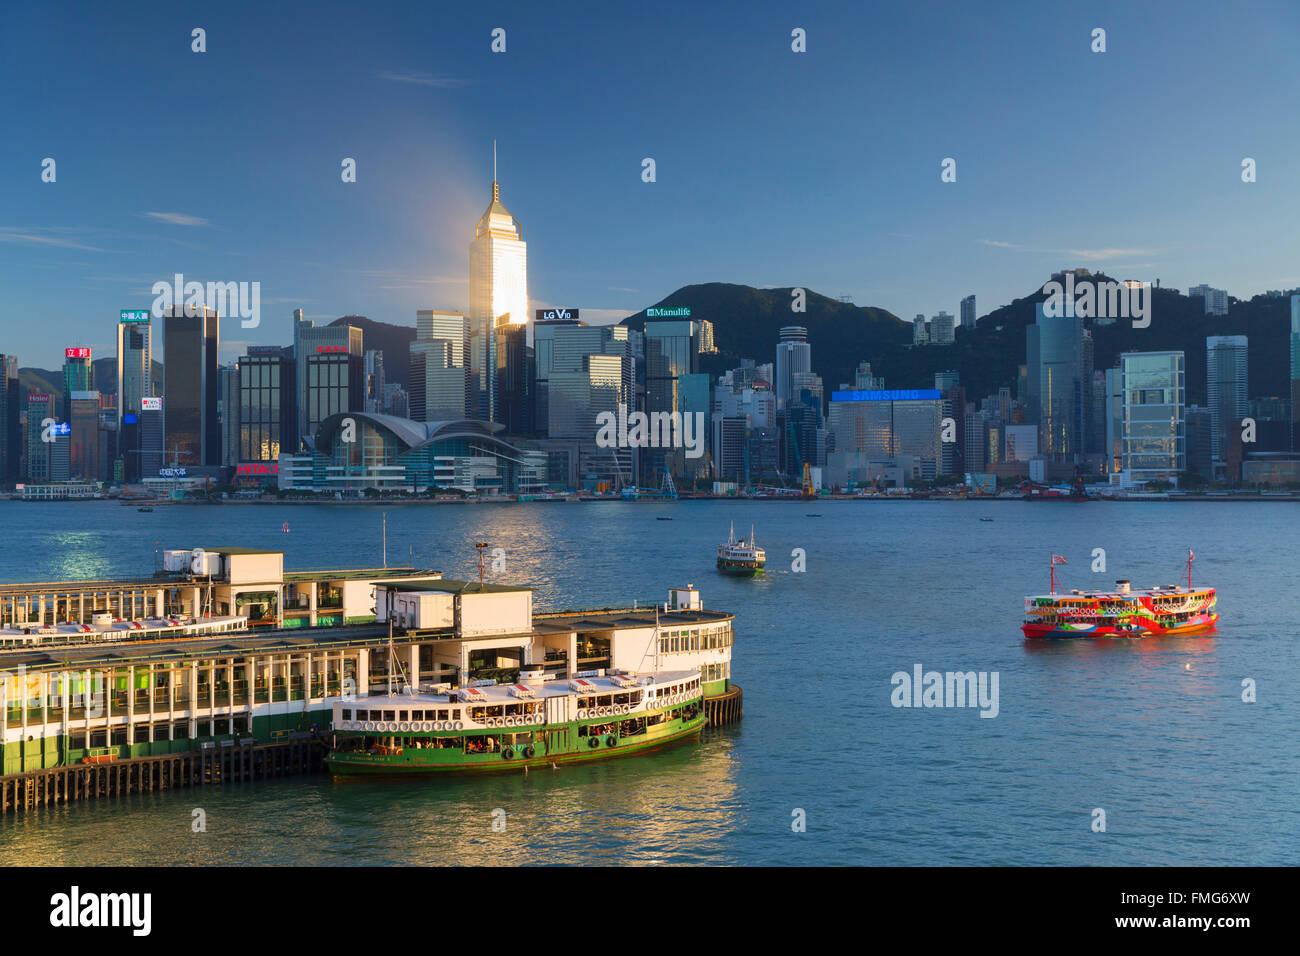 View of Star Ferry Terminal and Hong Kong Island skyline, Hong Kong, China - Stock Image